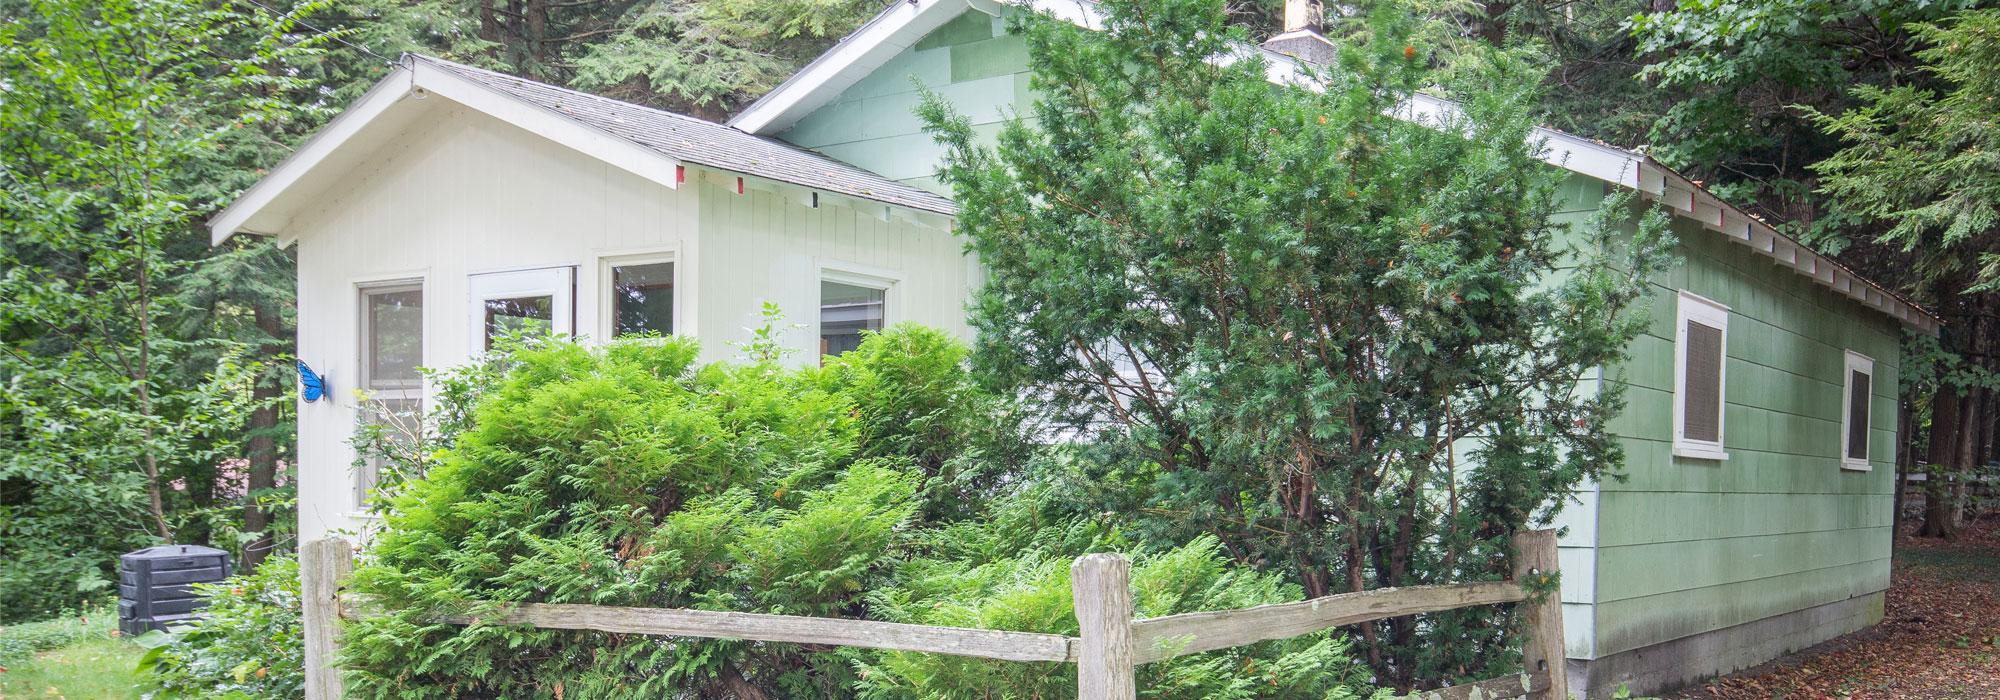 Super Cottage Rentals Waterfront Cottage Traverse City Mi Home Interior And Landscaping Ologienasavecom